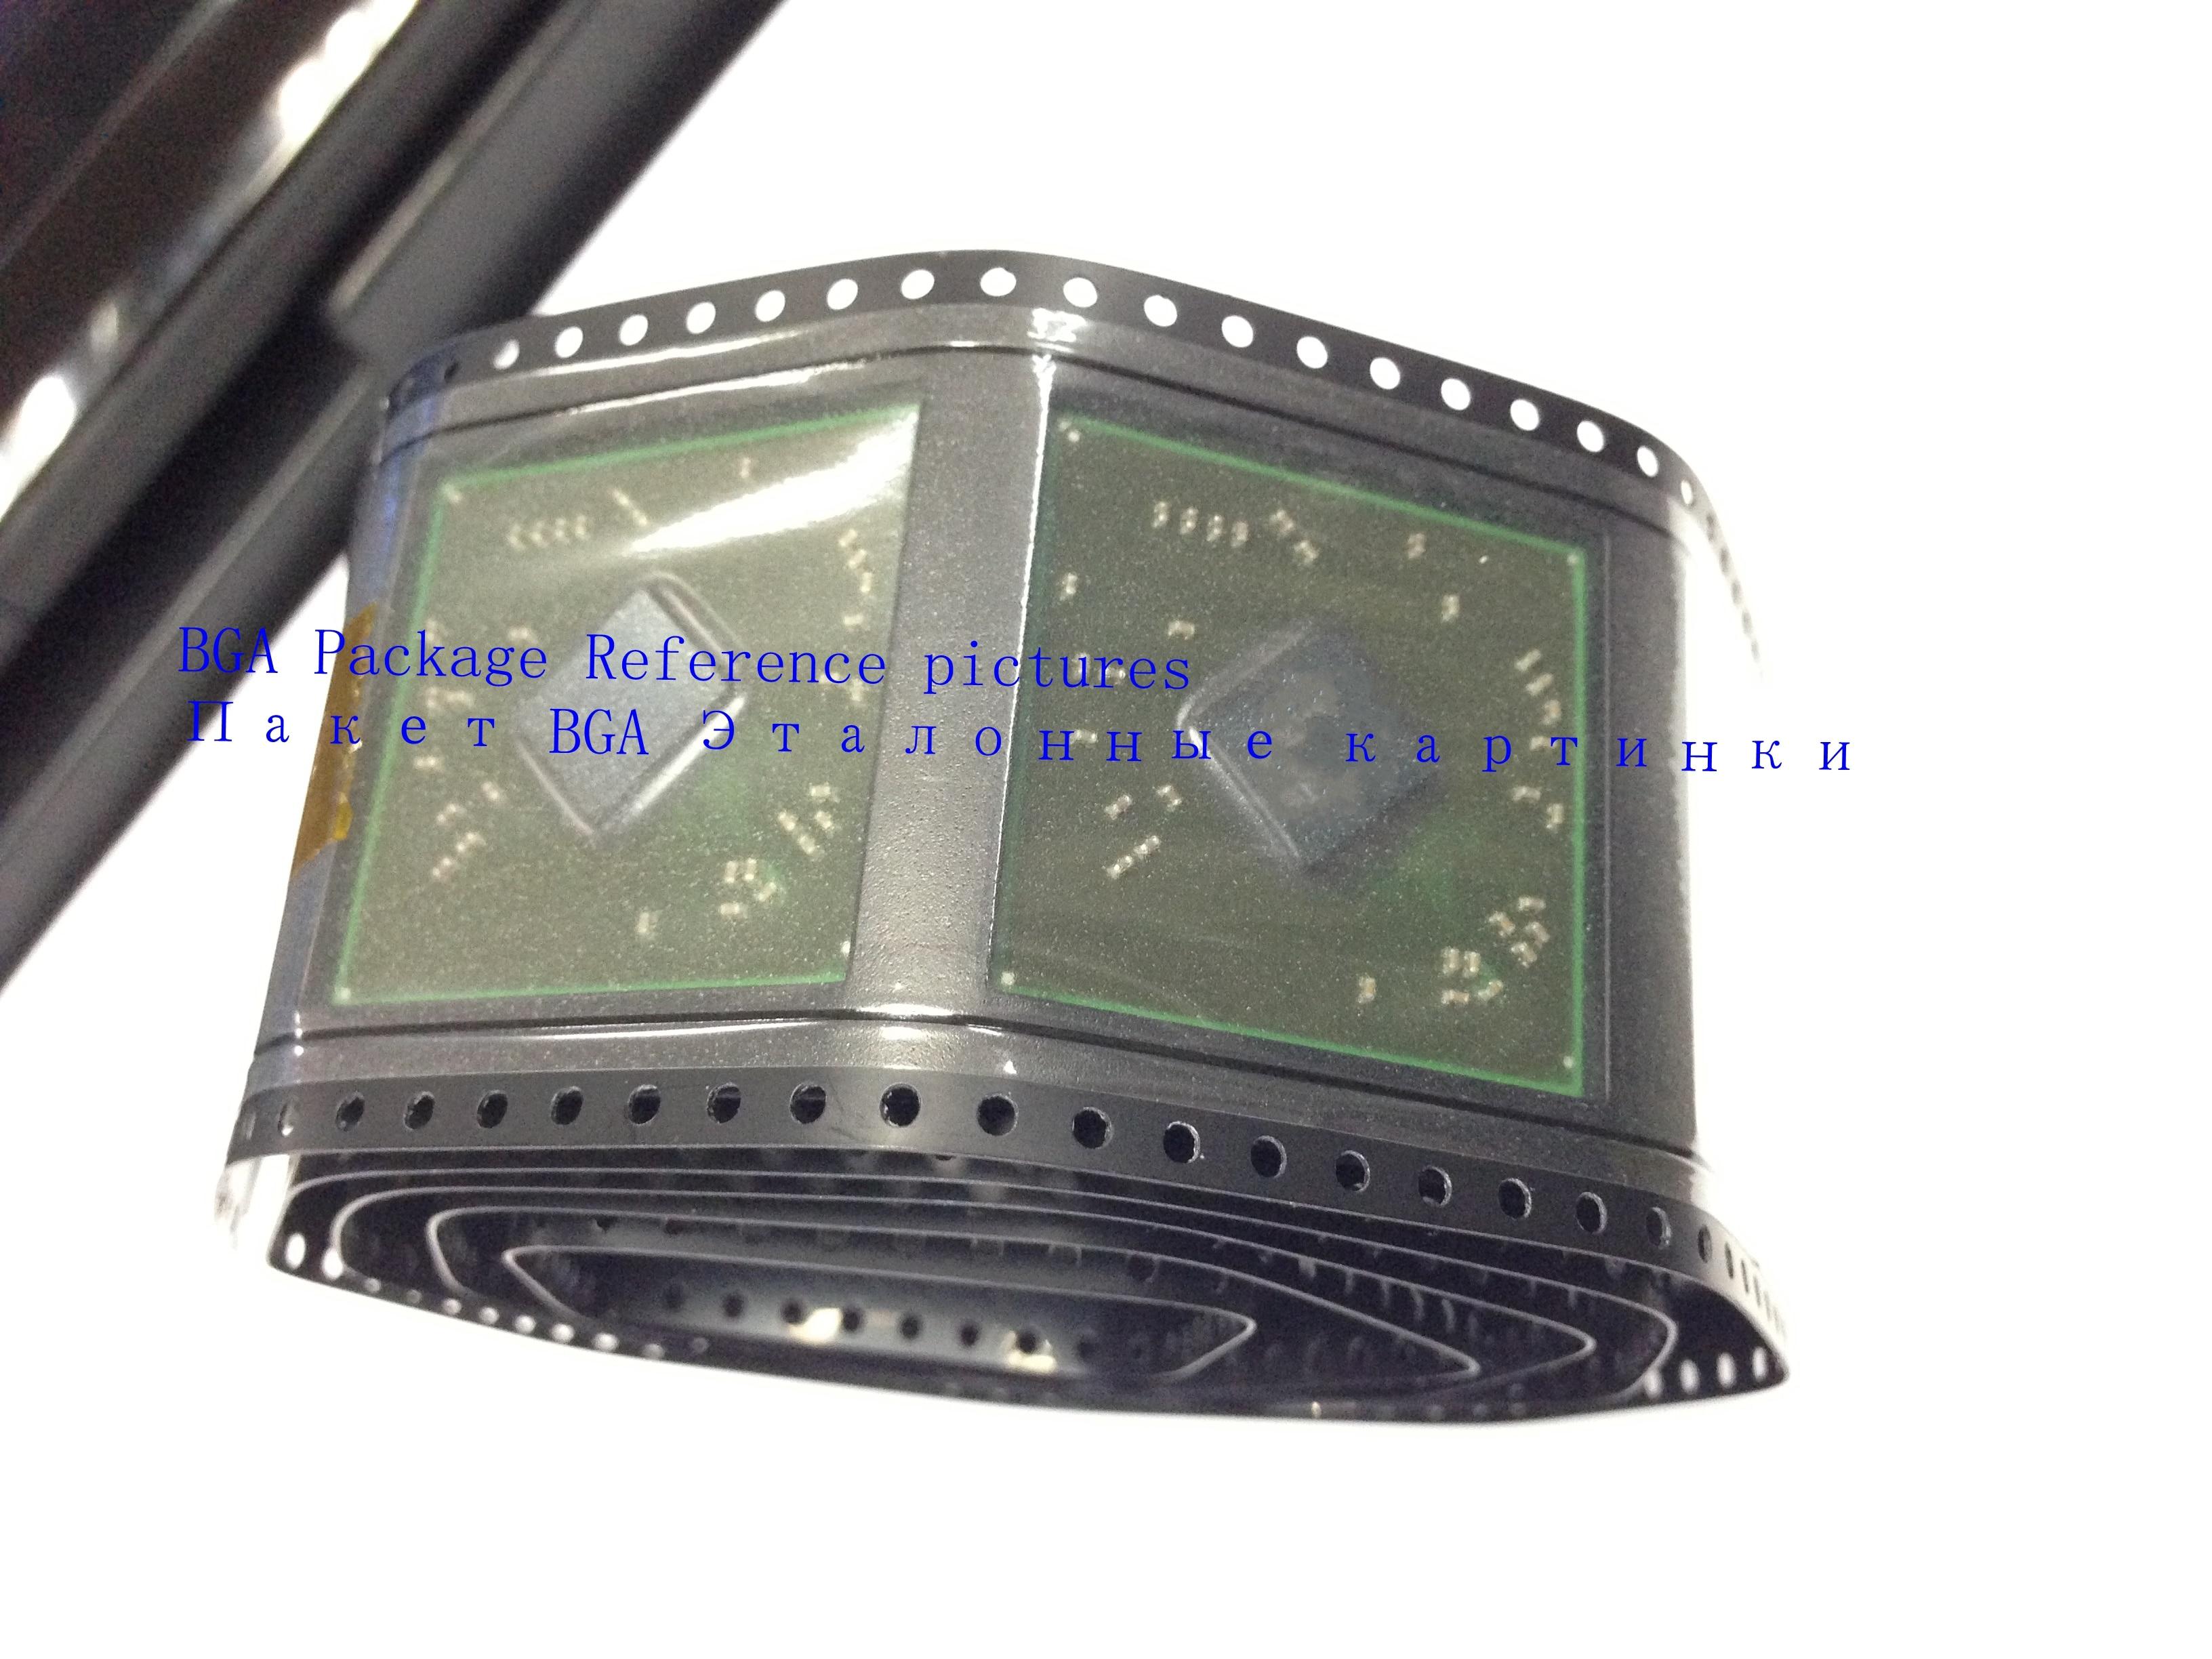 1 pz/lotto 100% Nuovo N14M-GE-B-A2 N14M GE B A2 BGA Chipset1 pz/lotto 100% Nuovo N14M-GE-B-A2 N14M GE B A2 BGA Chipset